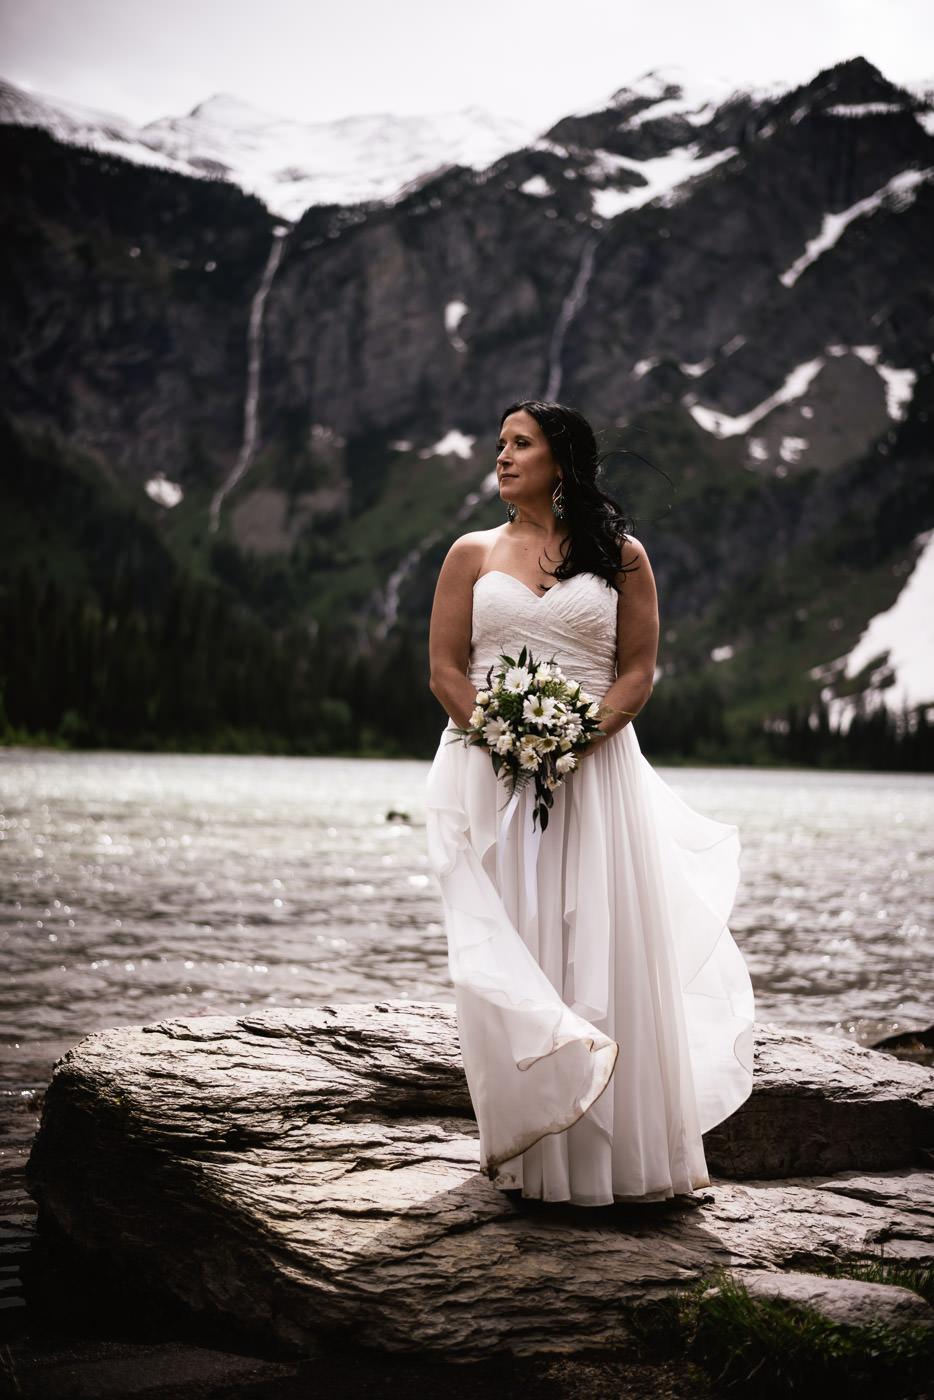 Beautiful Bridal portrait at Avalanche Lake.